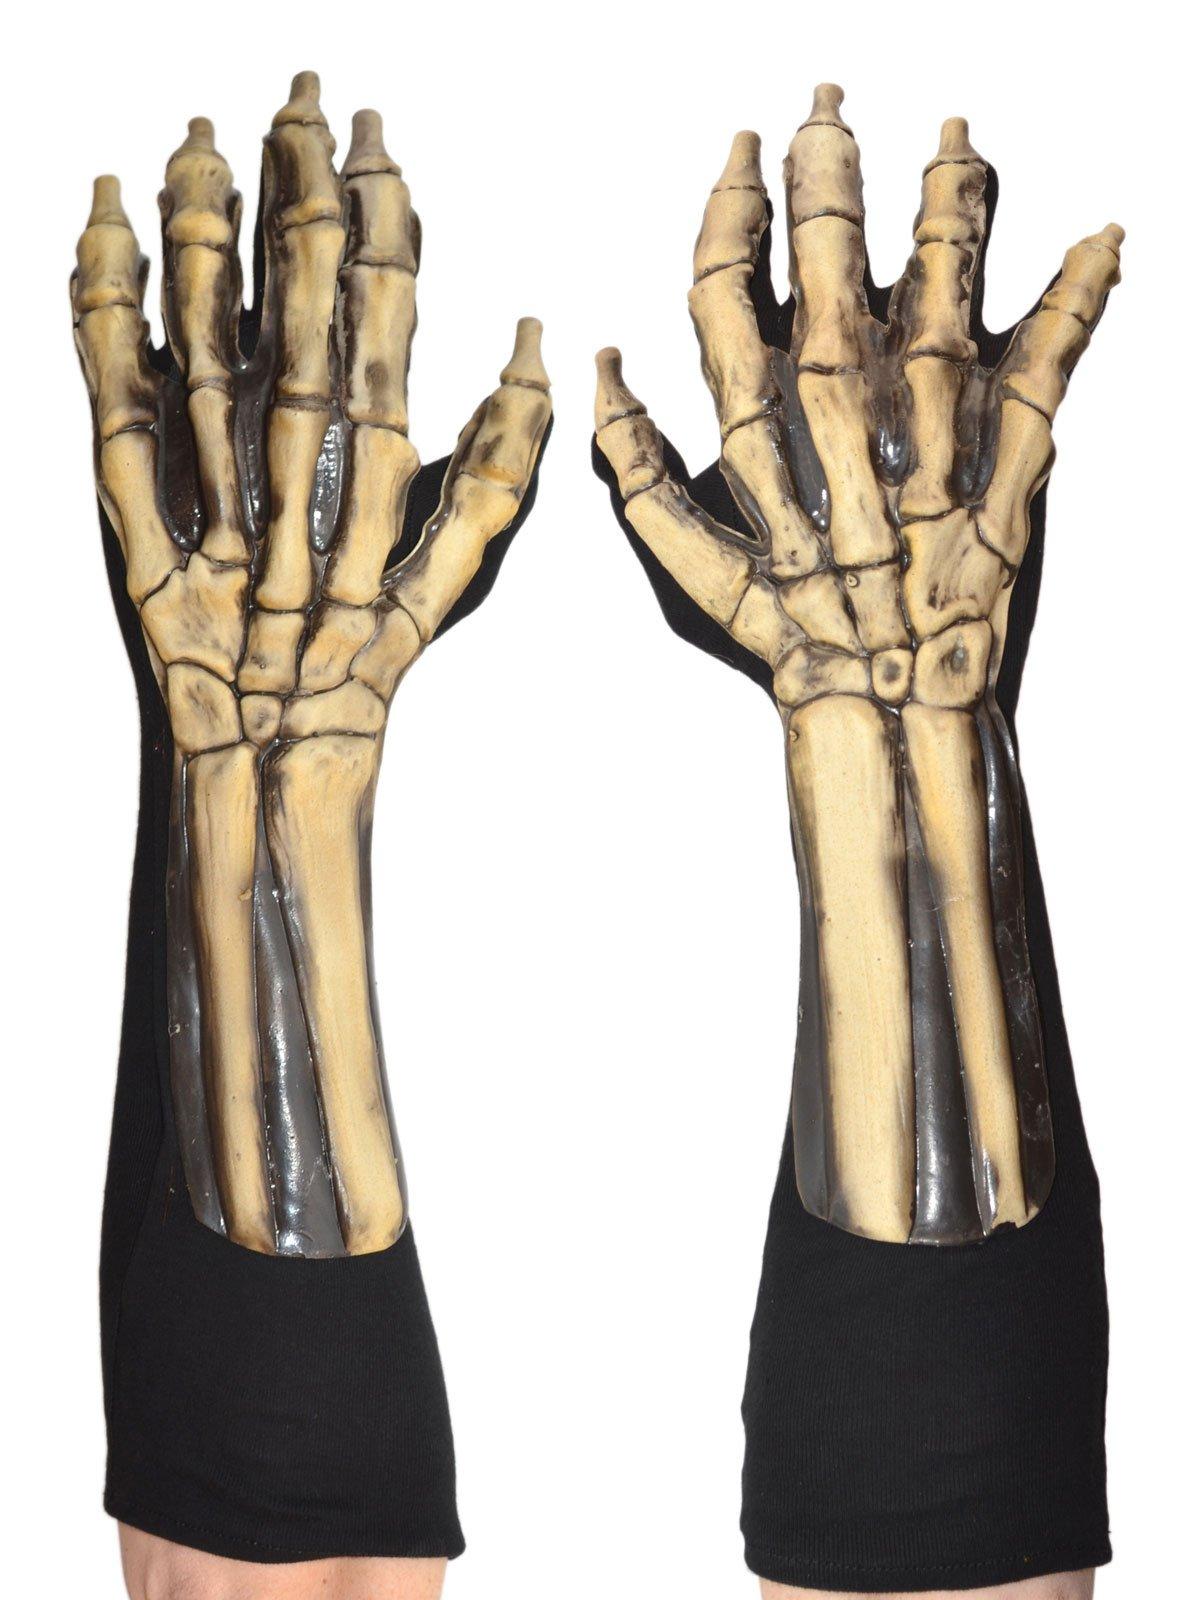 Zagone Skeleton Gloves, White Bones, Black Cotton Gloves